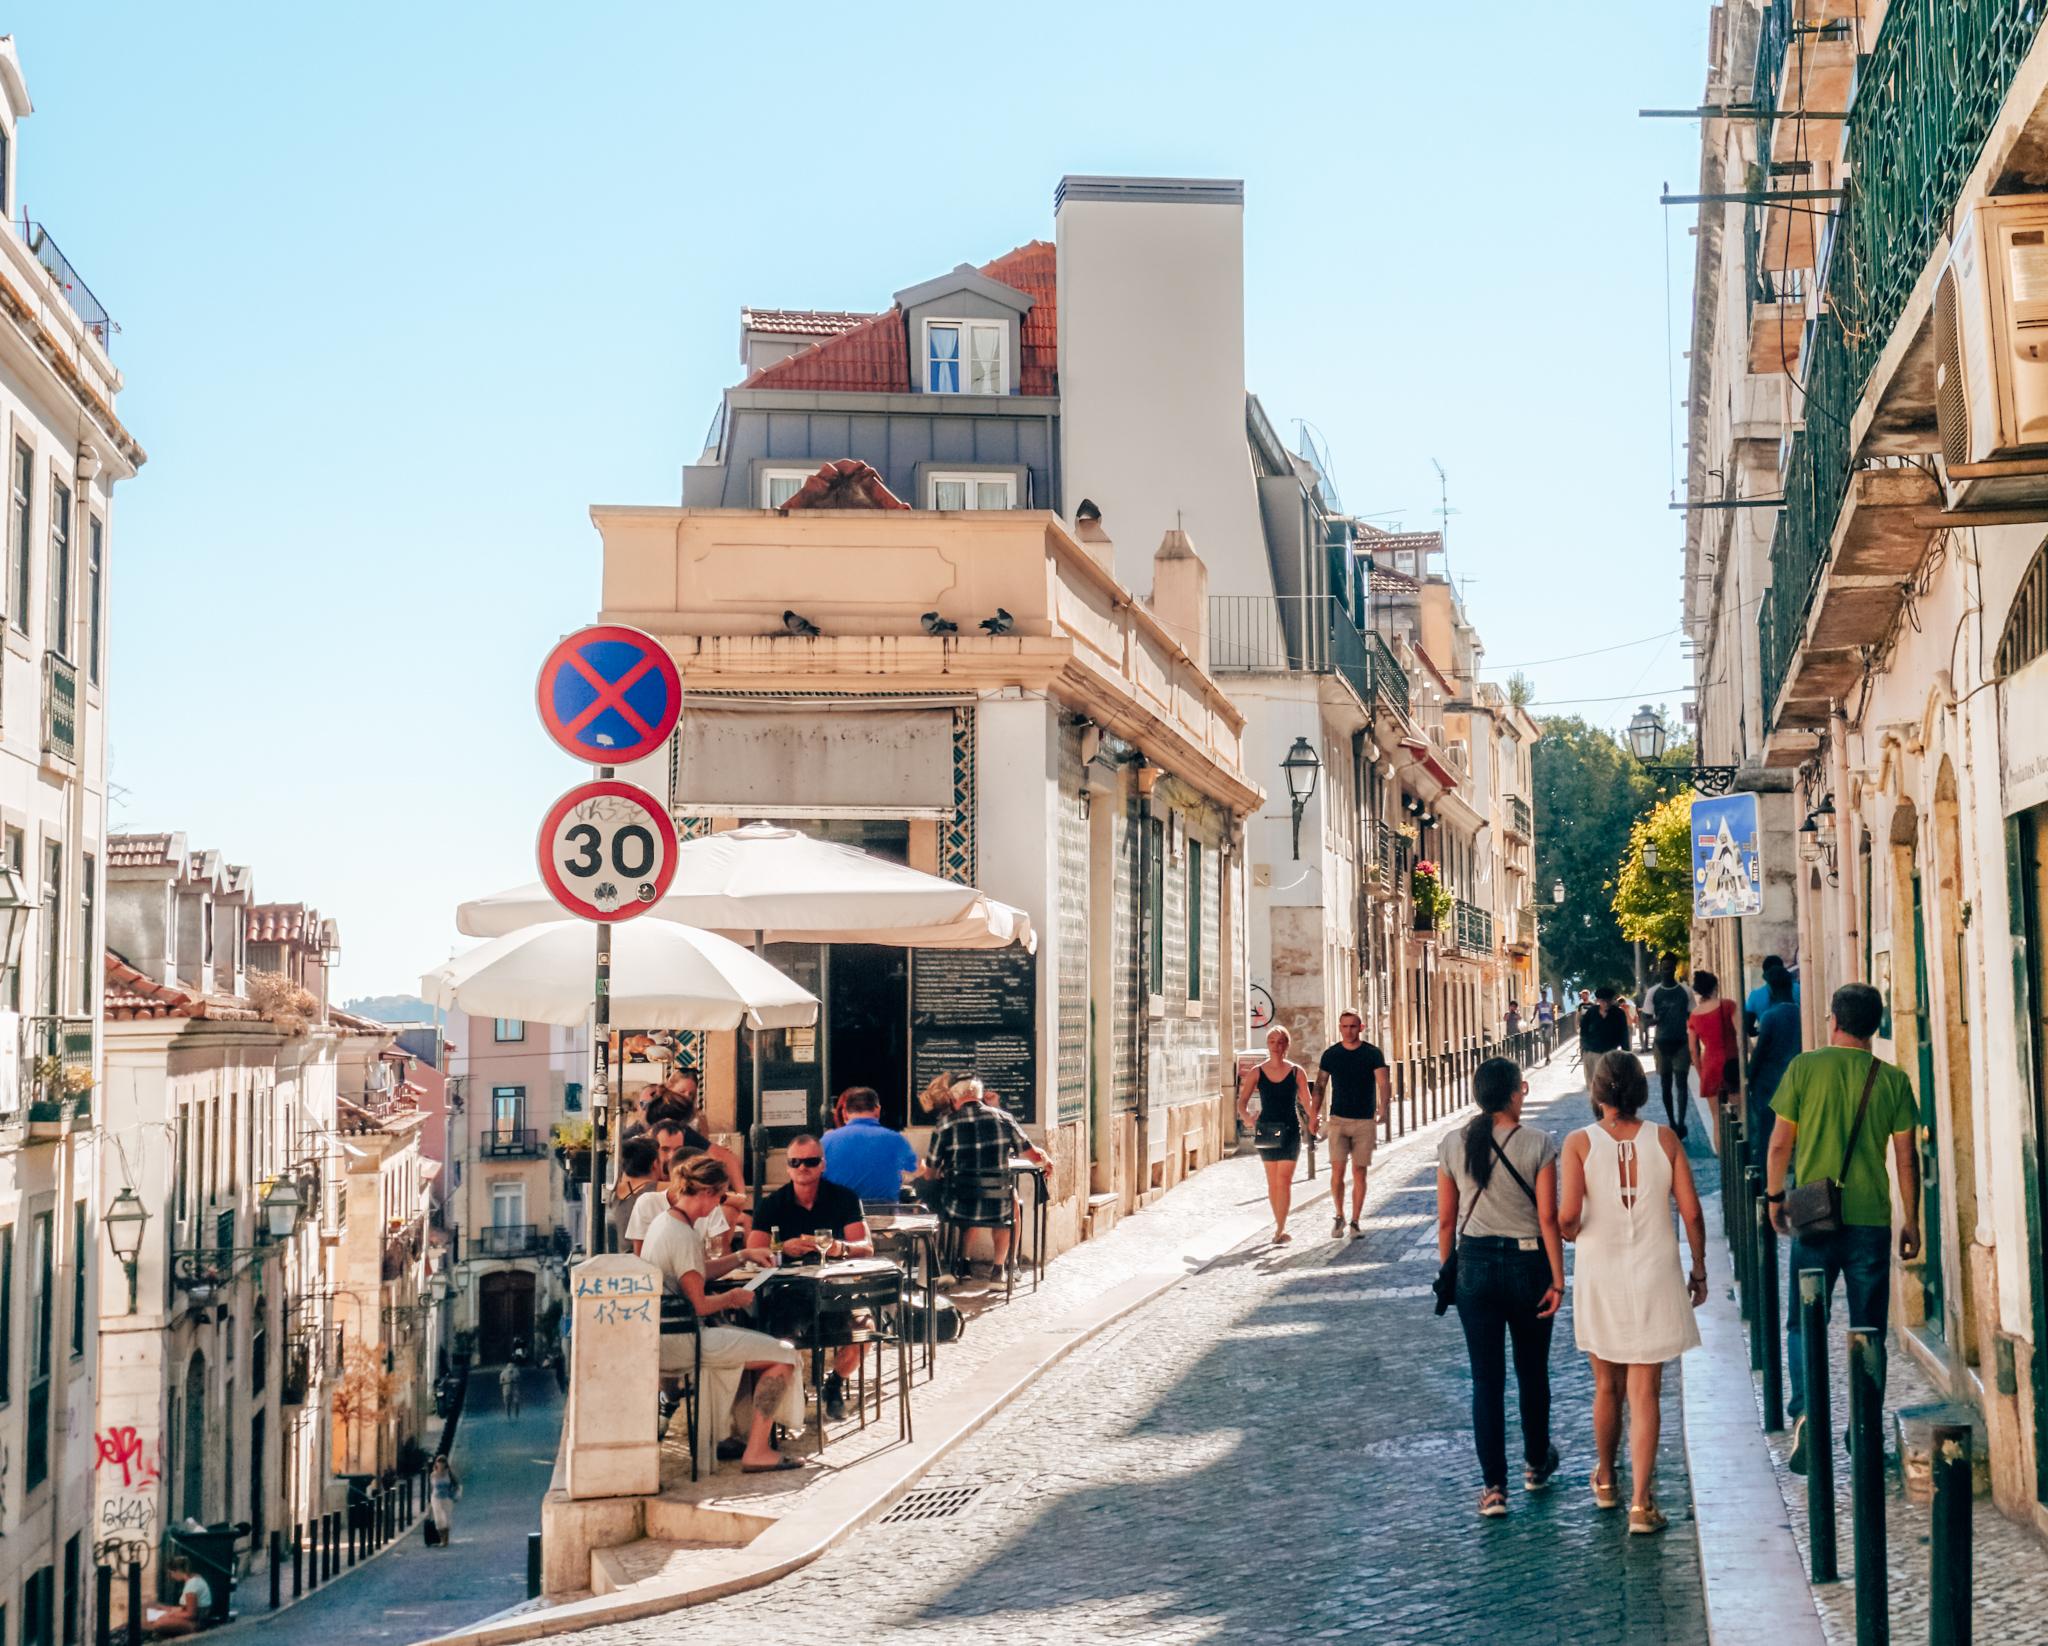 Bairro Alto street in Lisbon